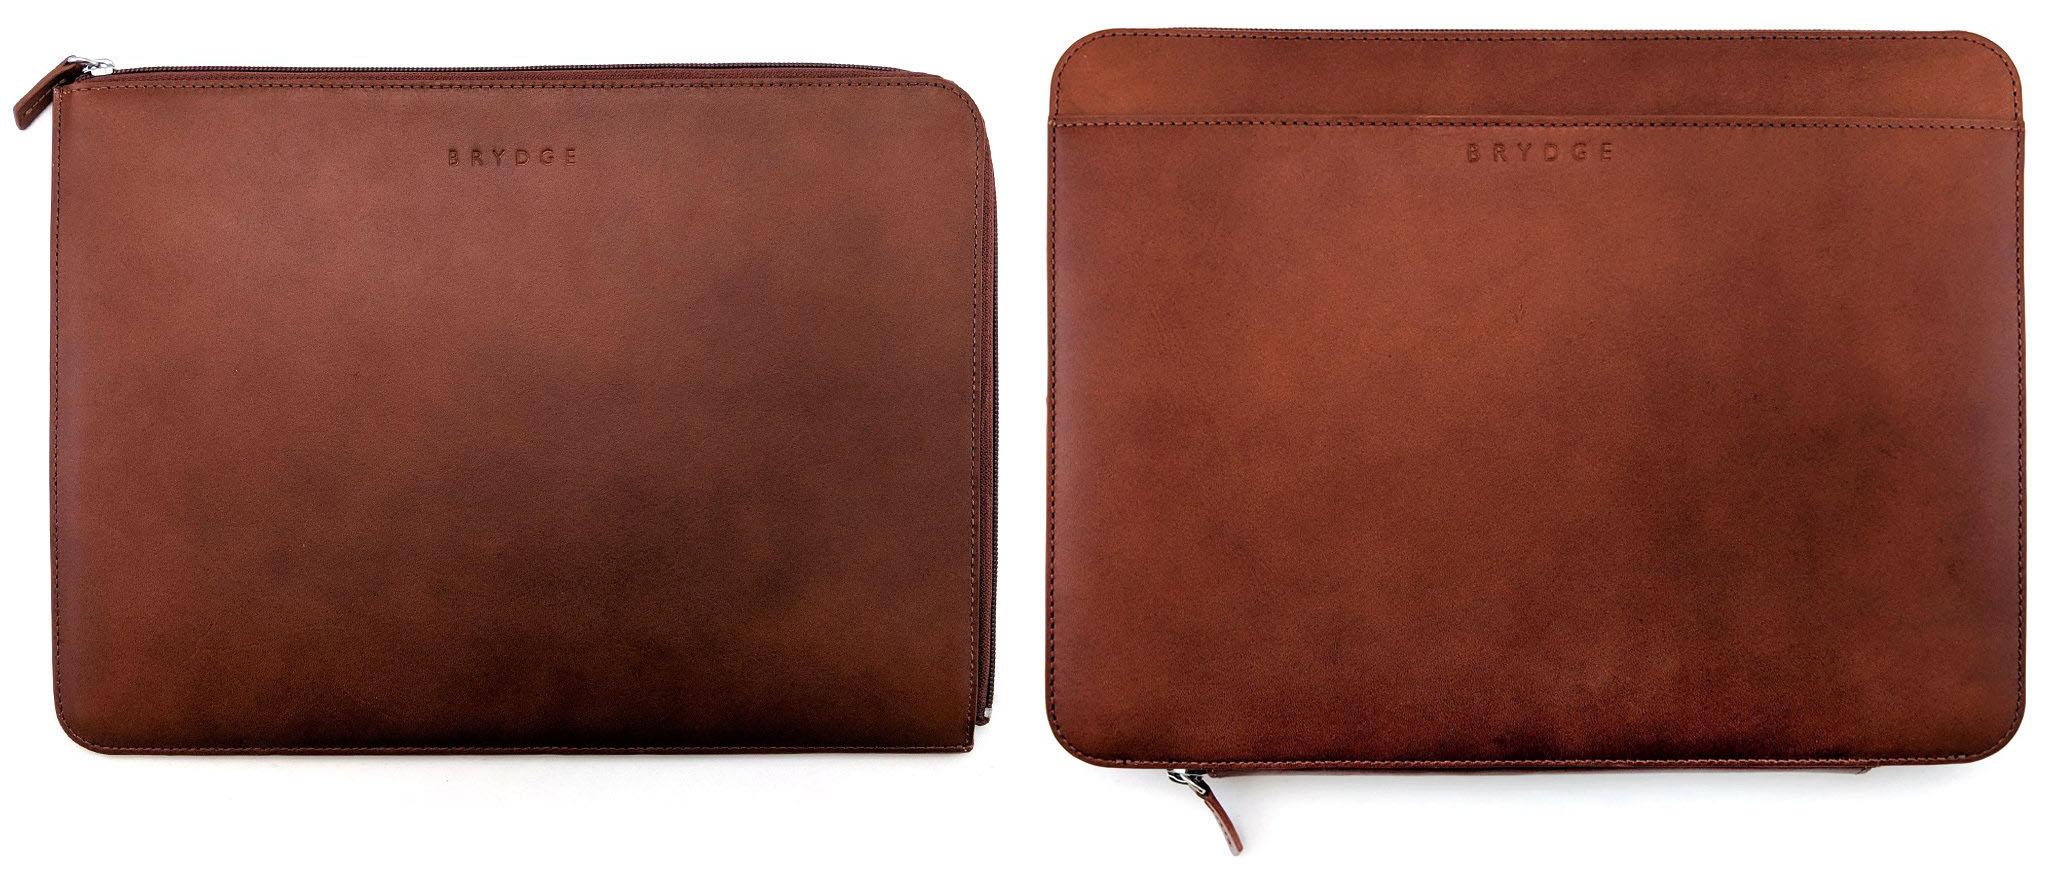 Brydge leather iPad cases